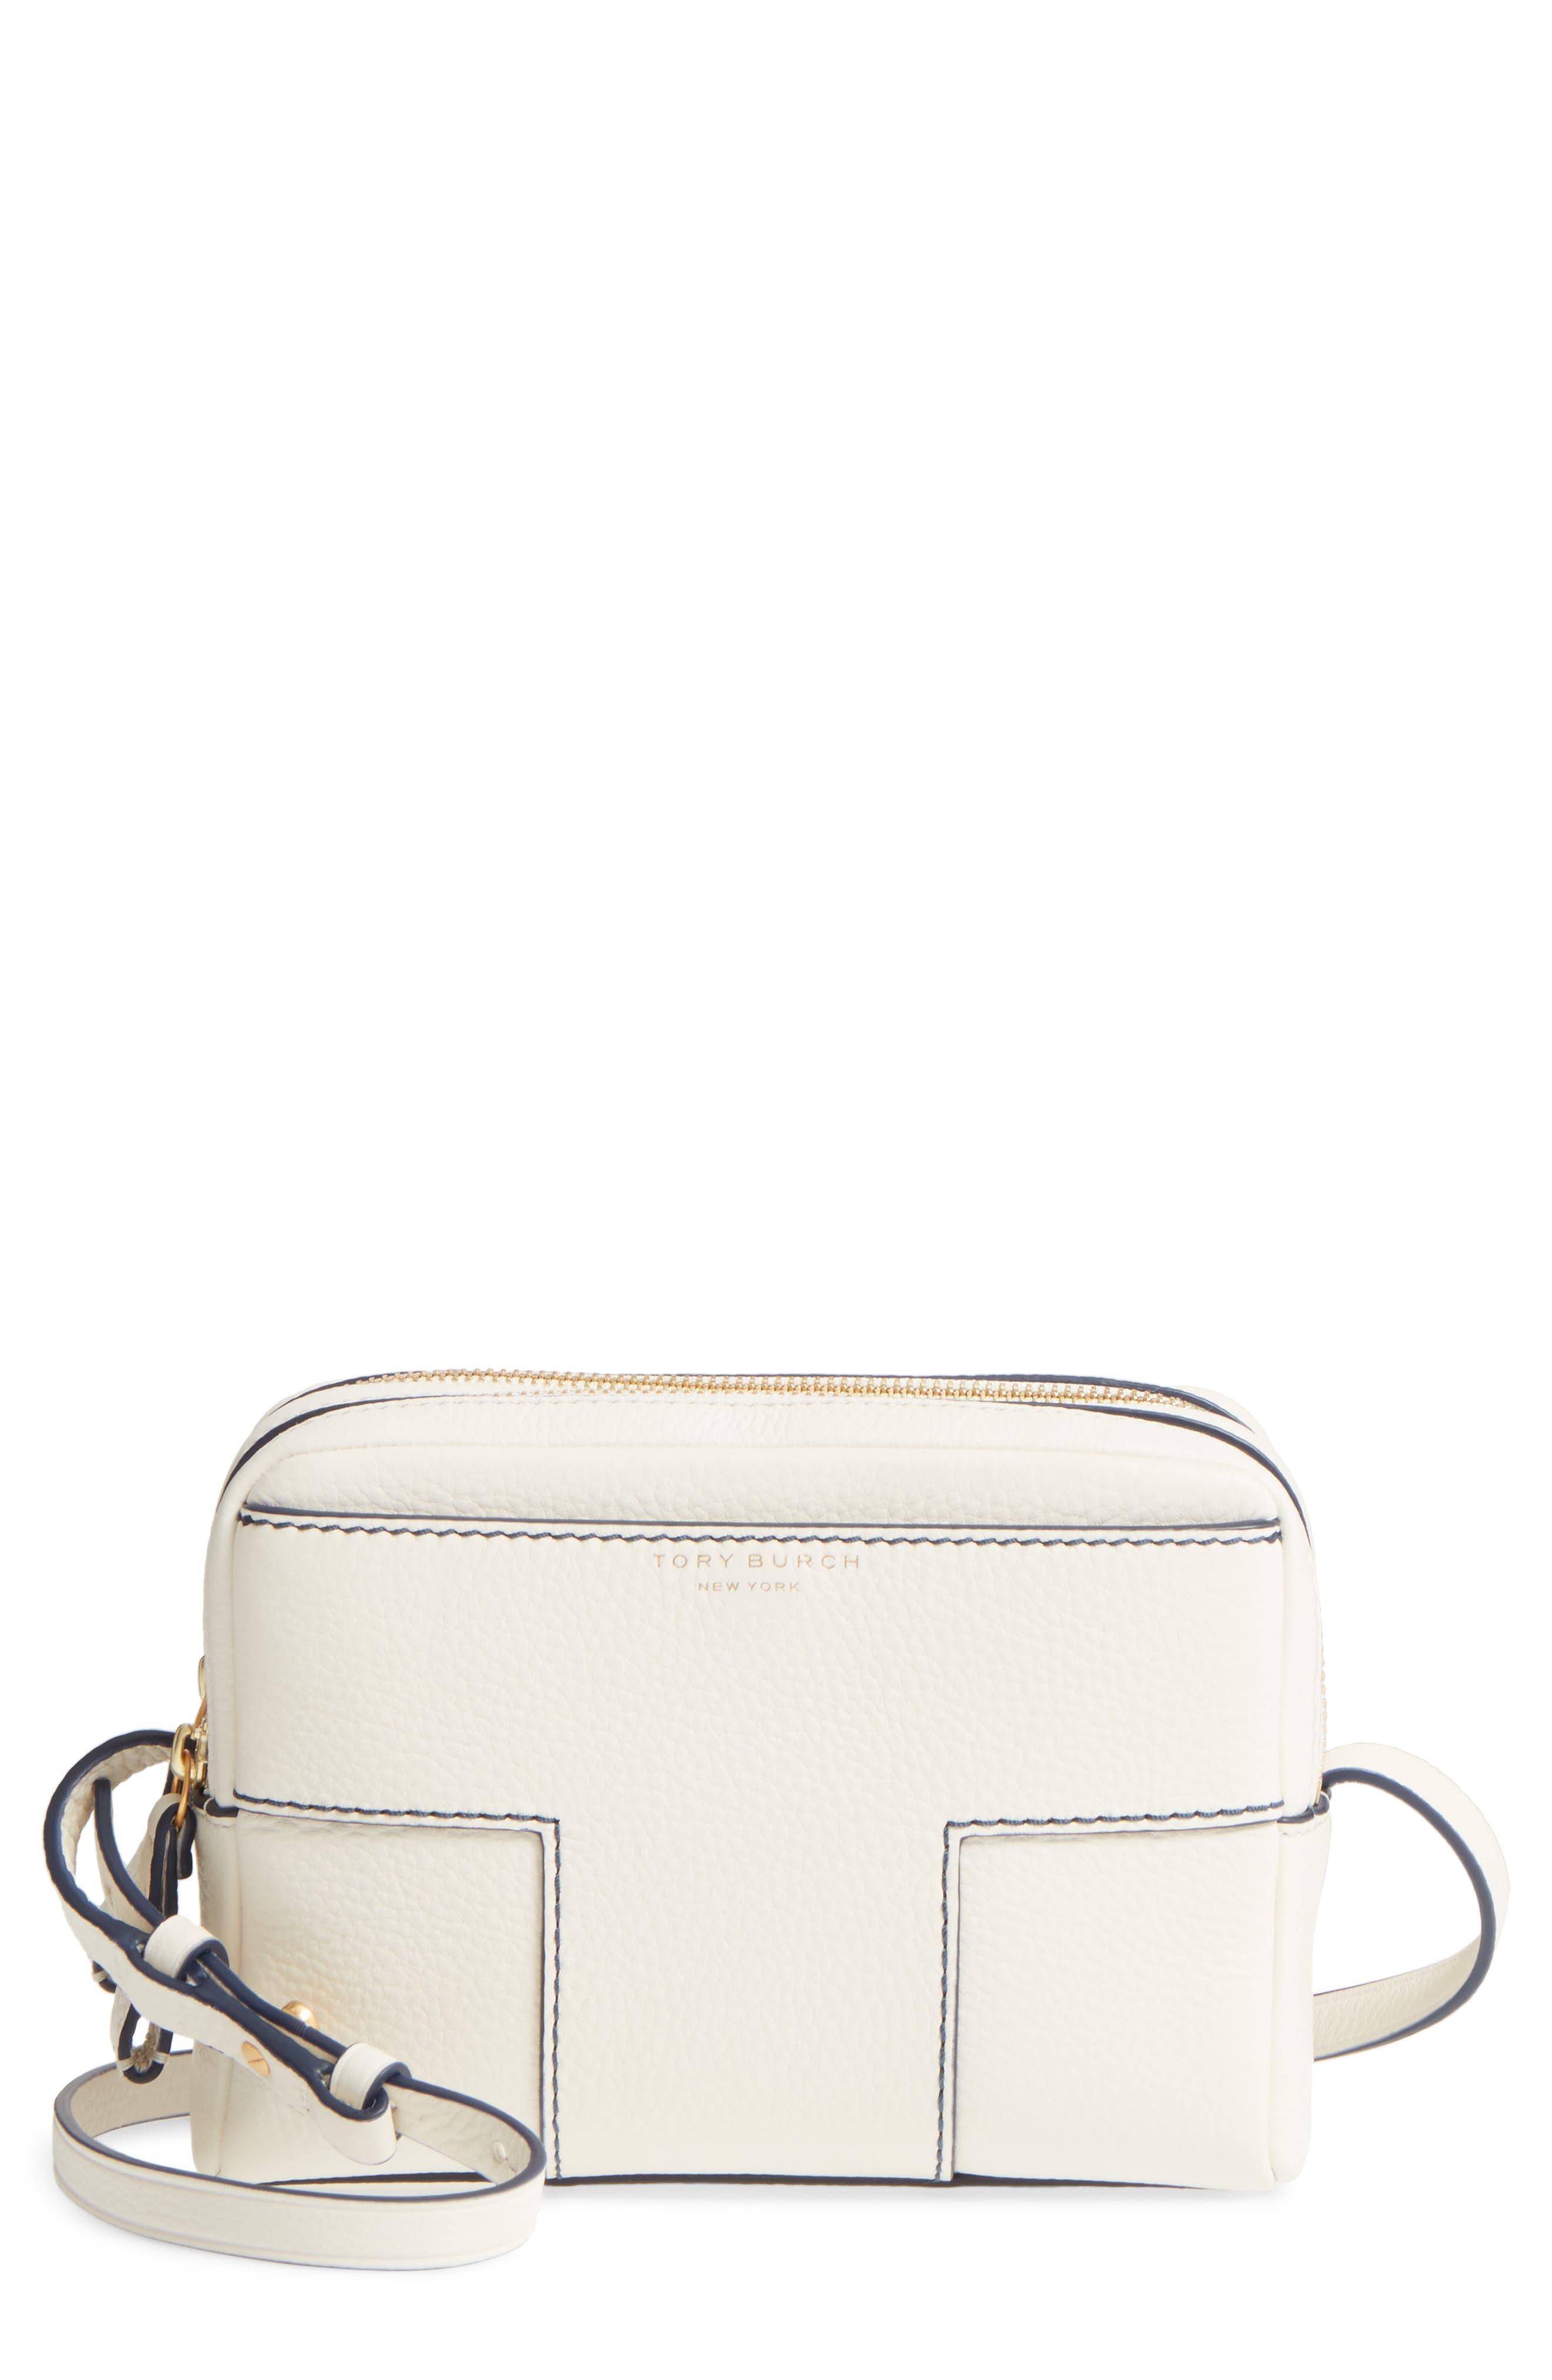 Block-T Double Zip Leather Crossbody Bag,                             Main thumbnail 1, color,